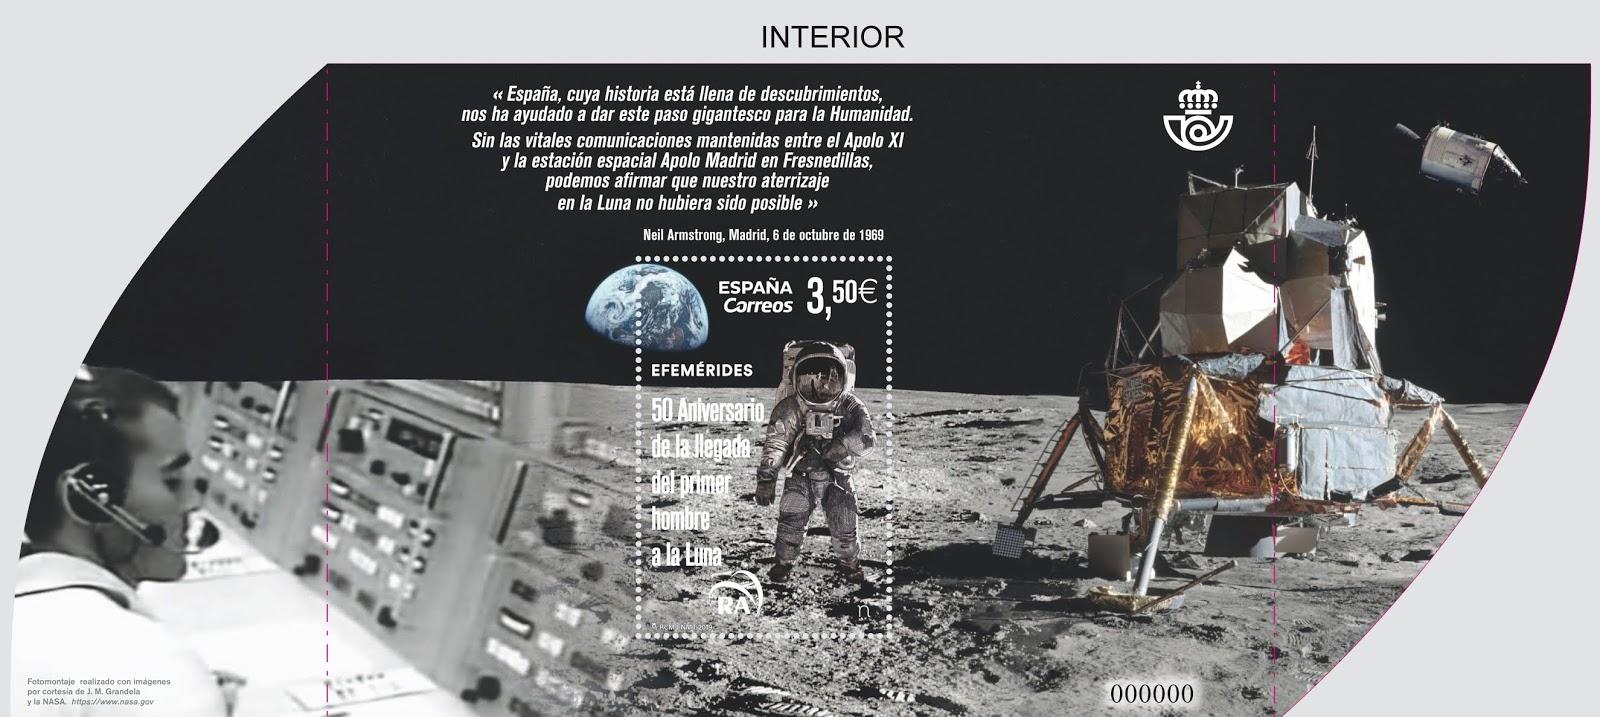 50 Aniversario de la llegada del primer hombre a la luna